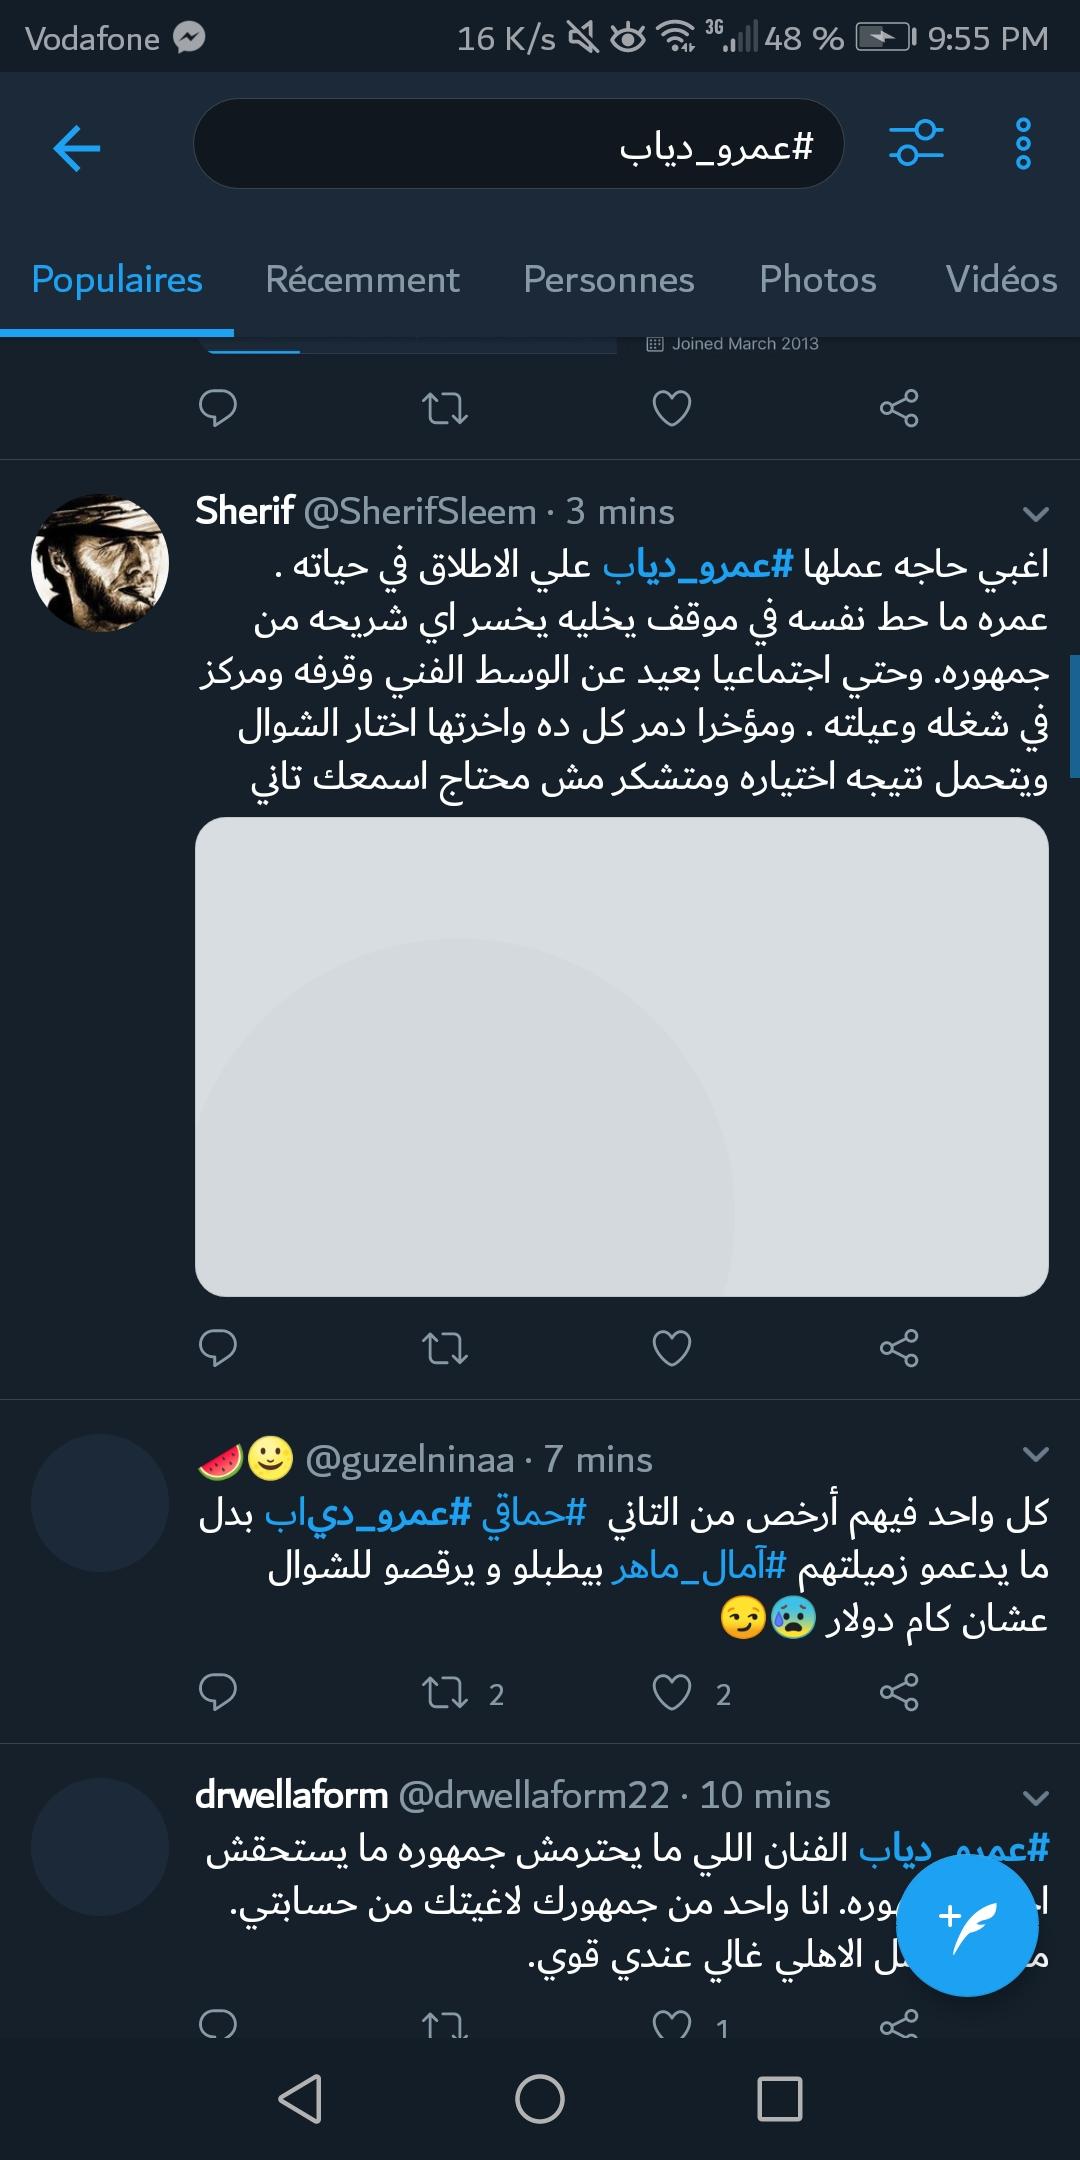 بعد تضامنه مع تركي آل الشيخ هاشتاج عمرو دياب يتصدر تويتر